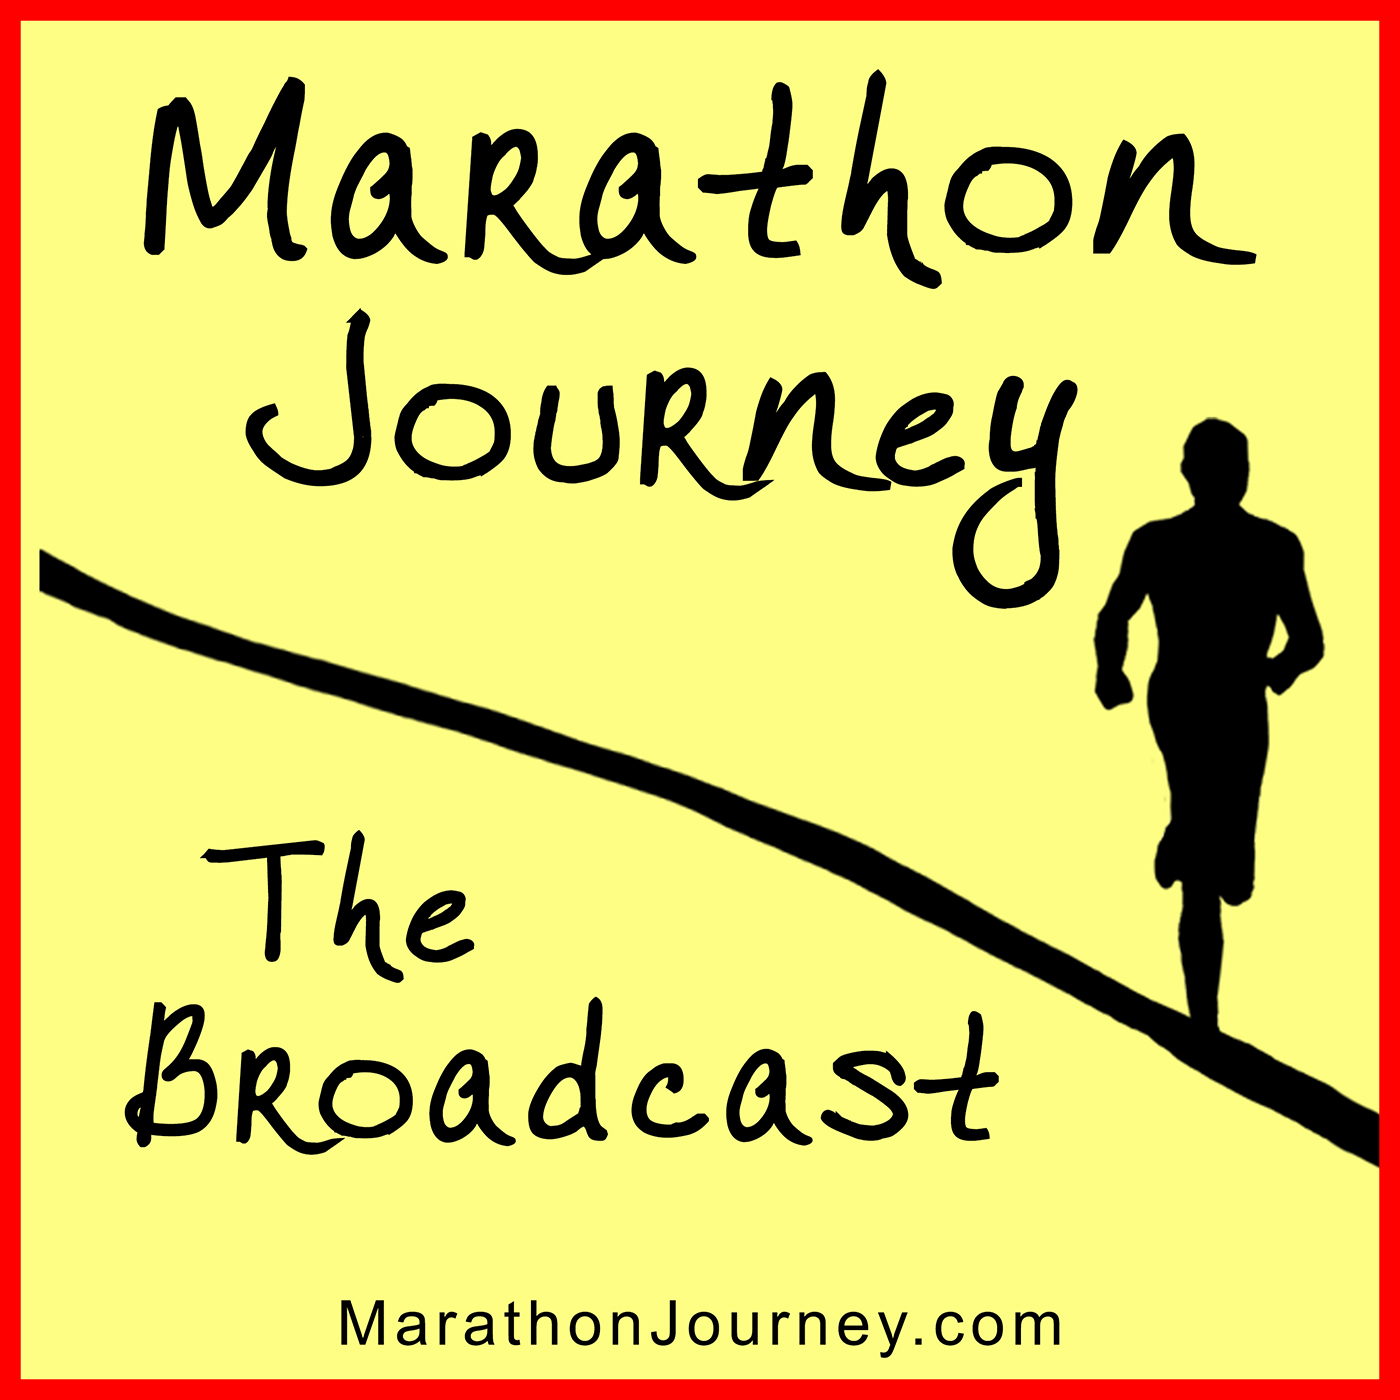 MJTB061 - The Santa Rosa Marathon